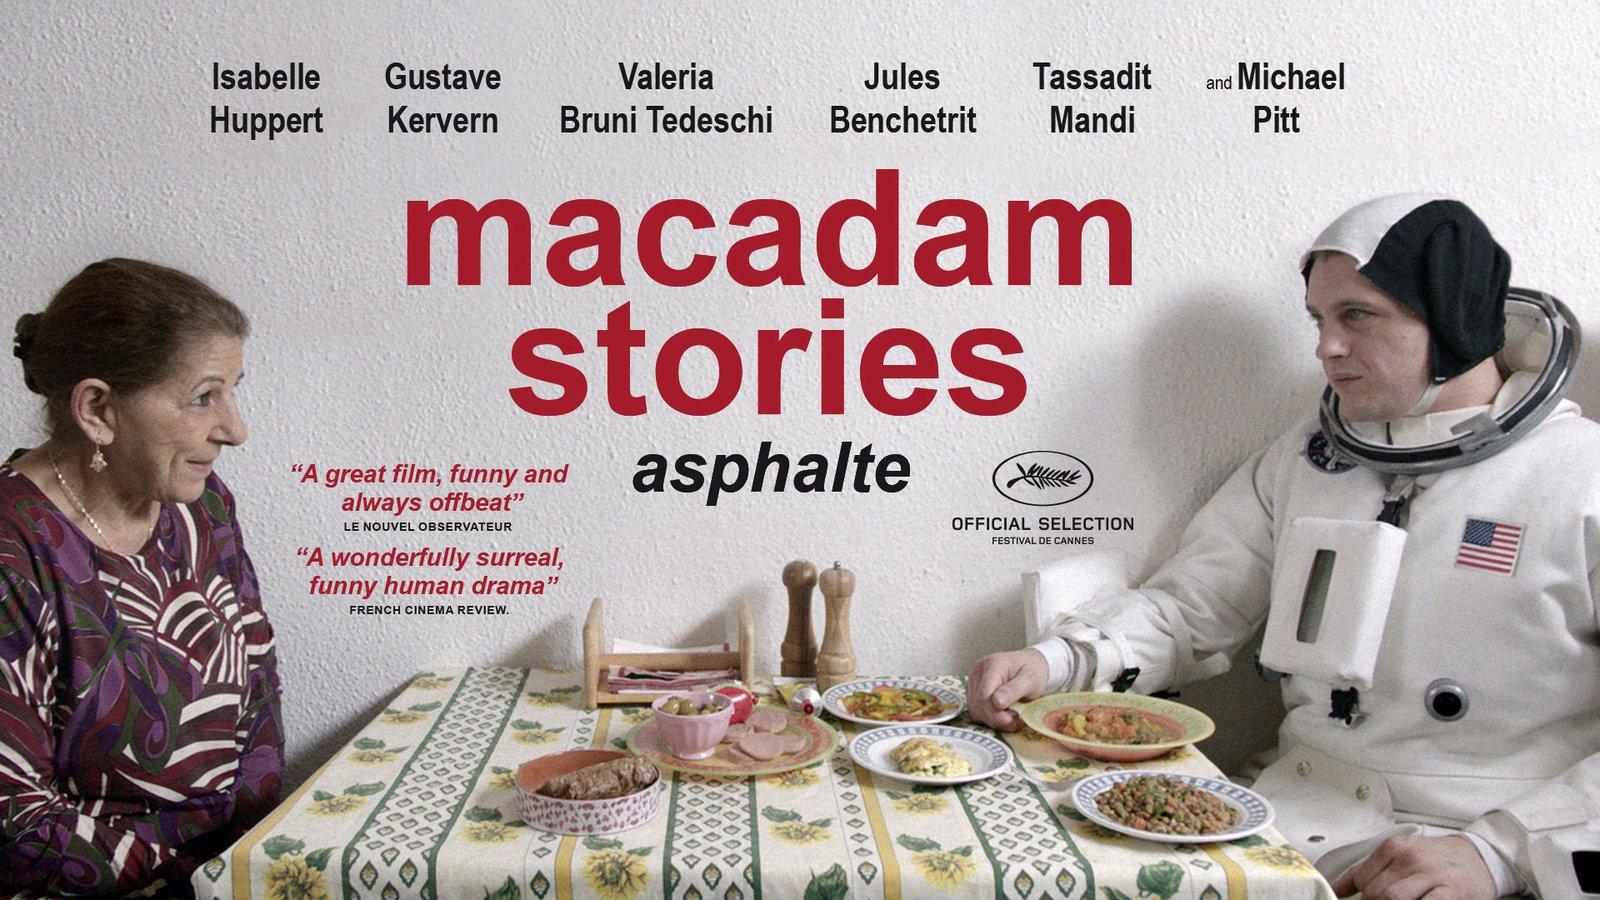 Macadam Stories - Asphalte